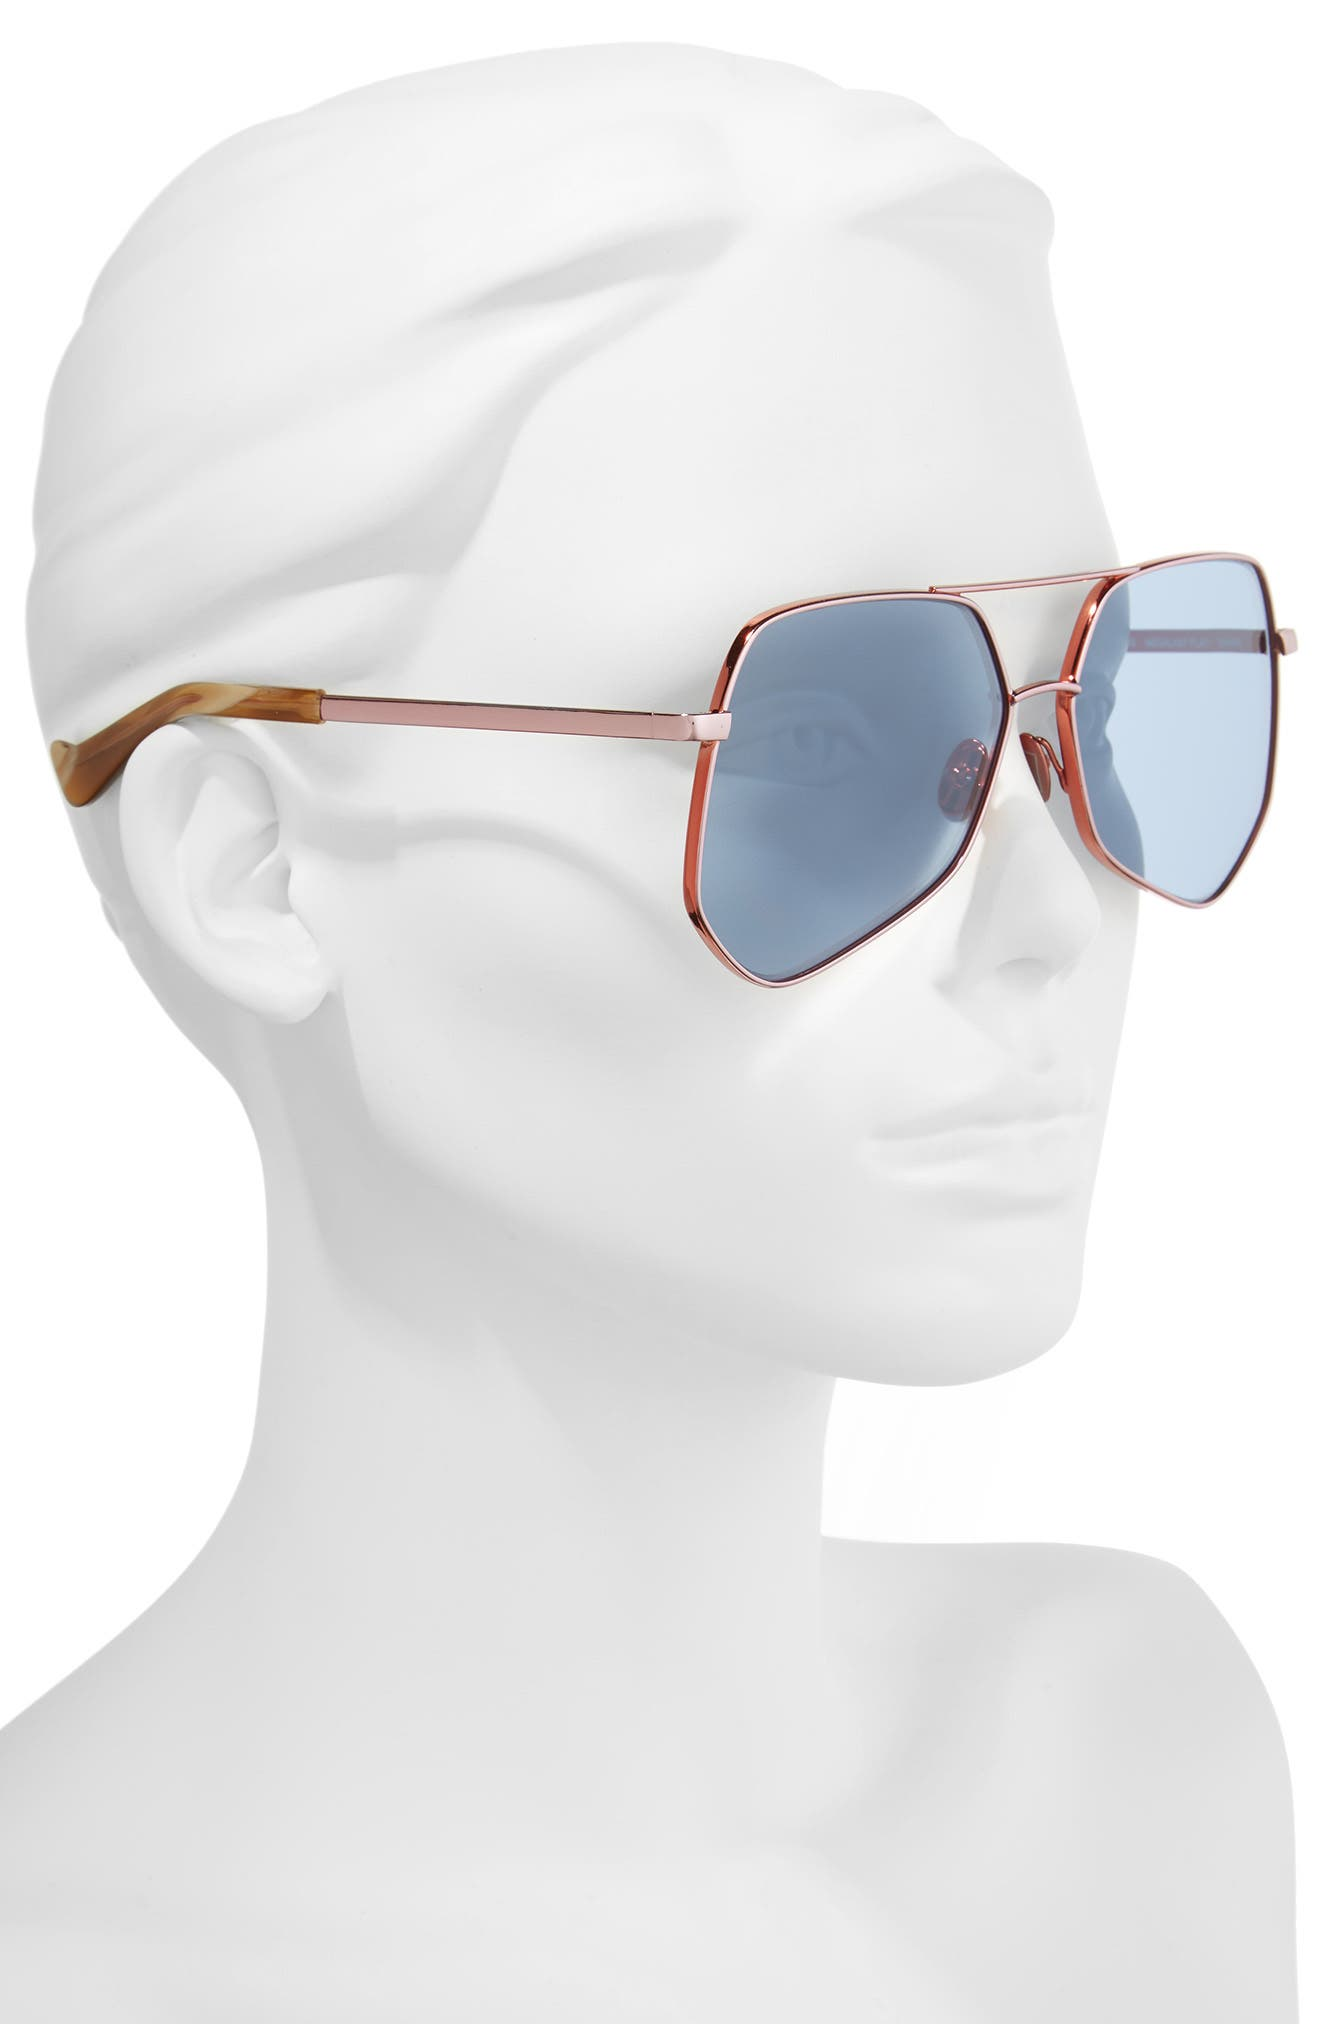 Megalast Flat 61mm Sunglasses,                             Alternate thumbnail 2, color,                             Copper Pink / Light Blue